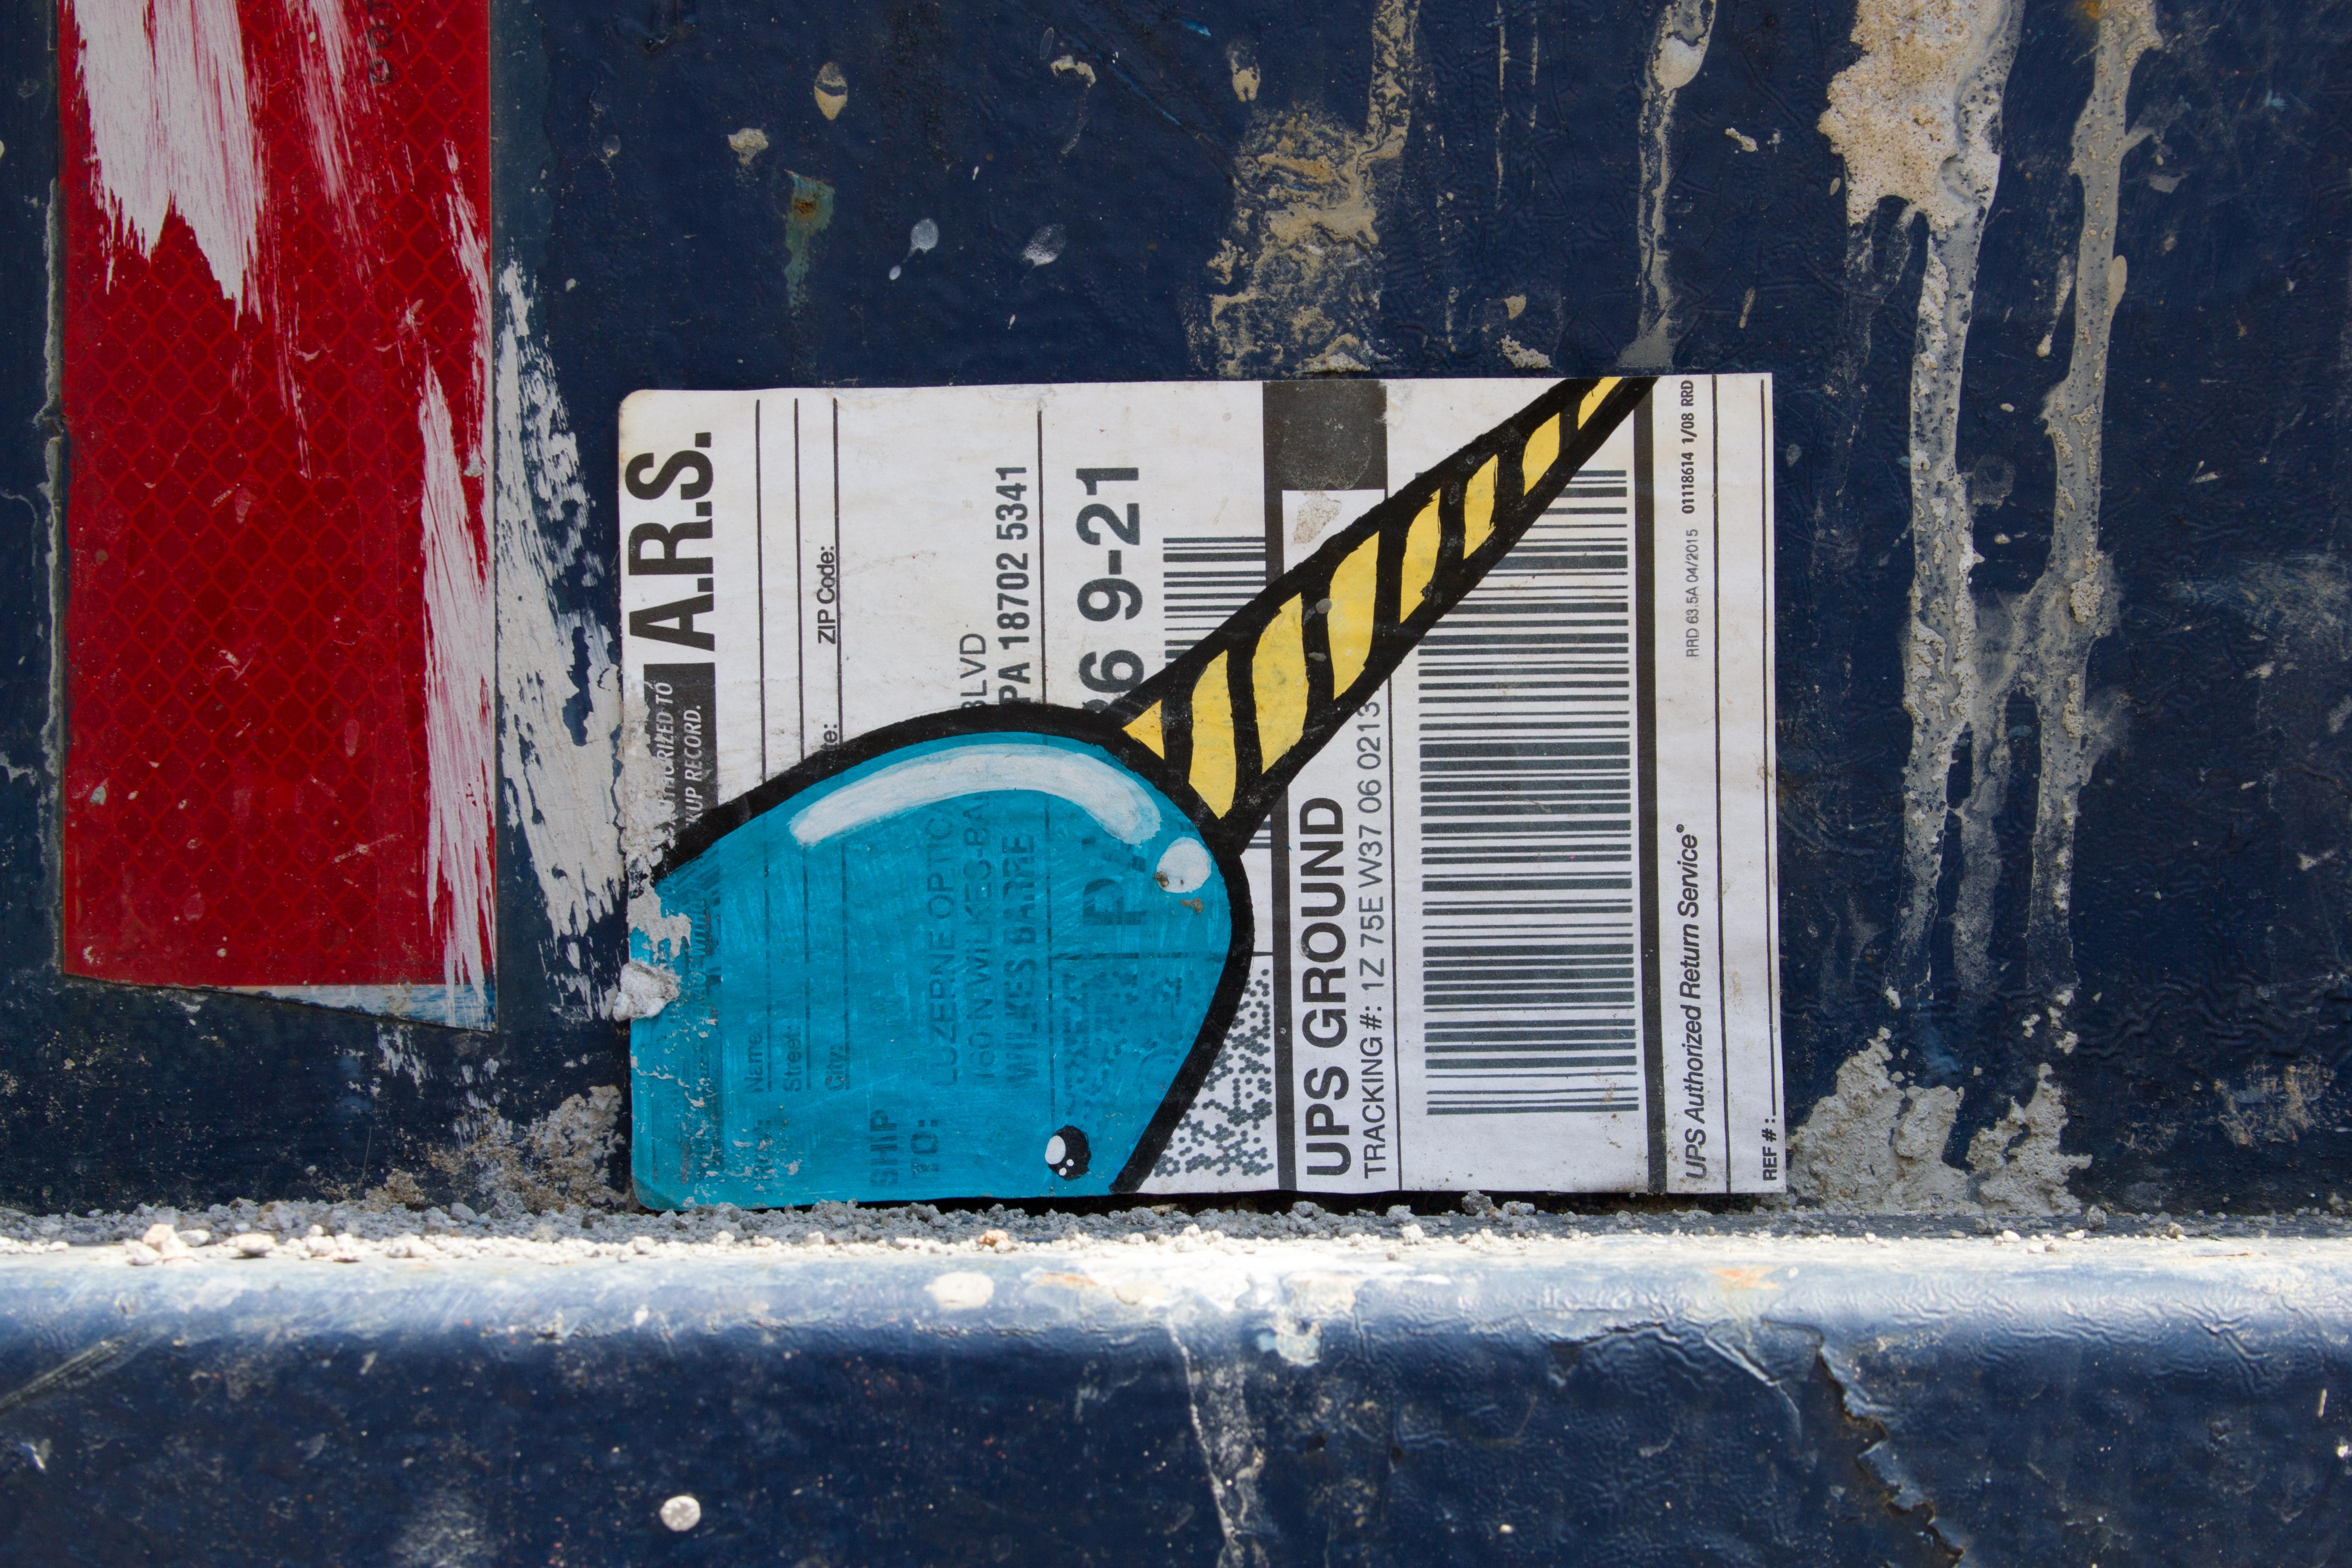 philly street art interviews faithsfunnn puts the funnn in philly